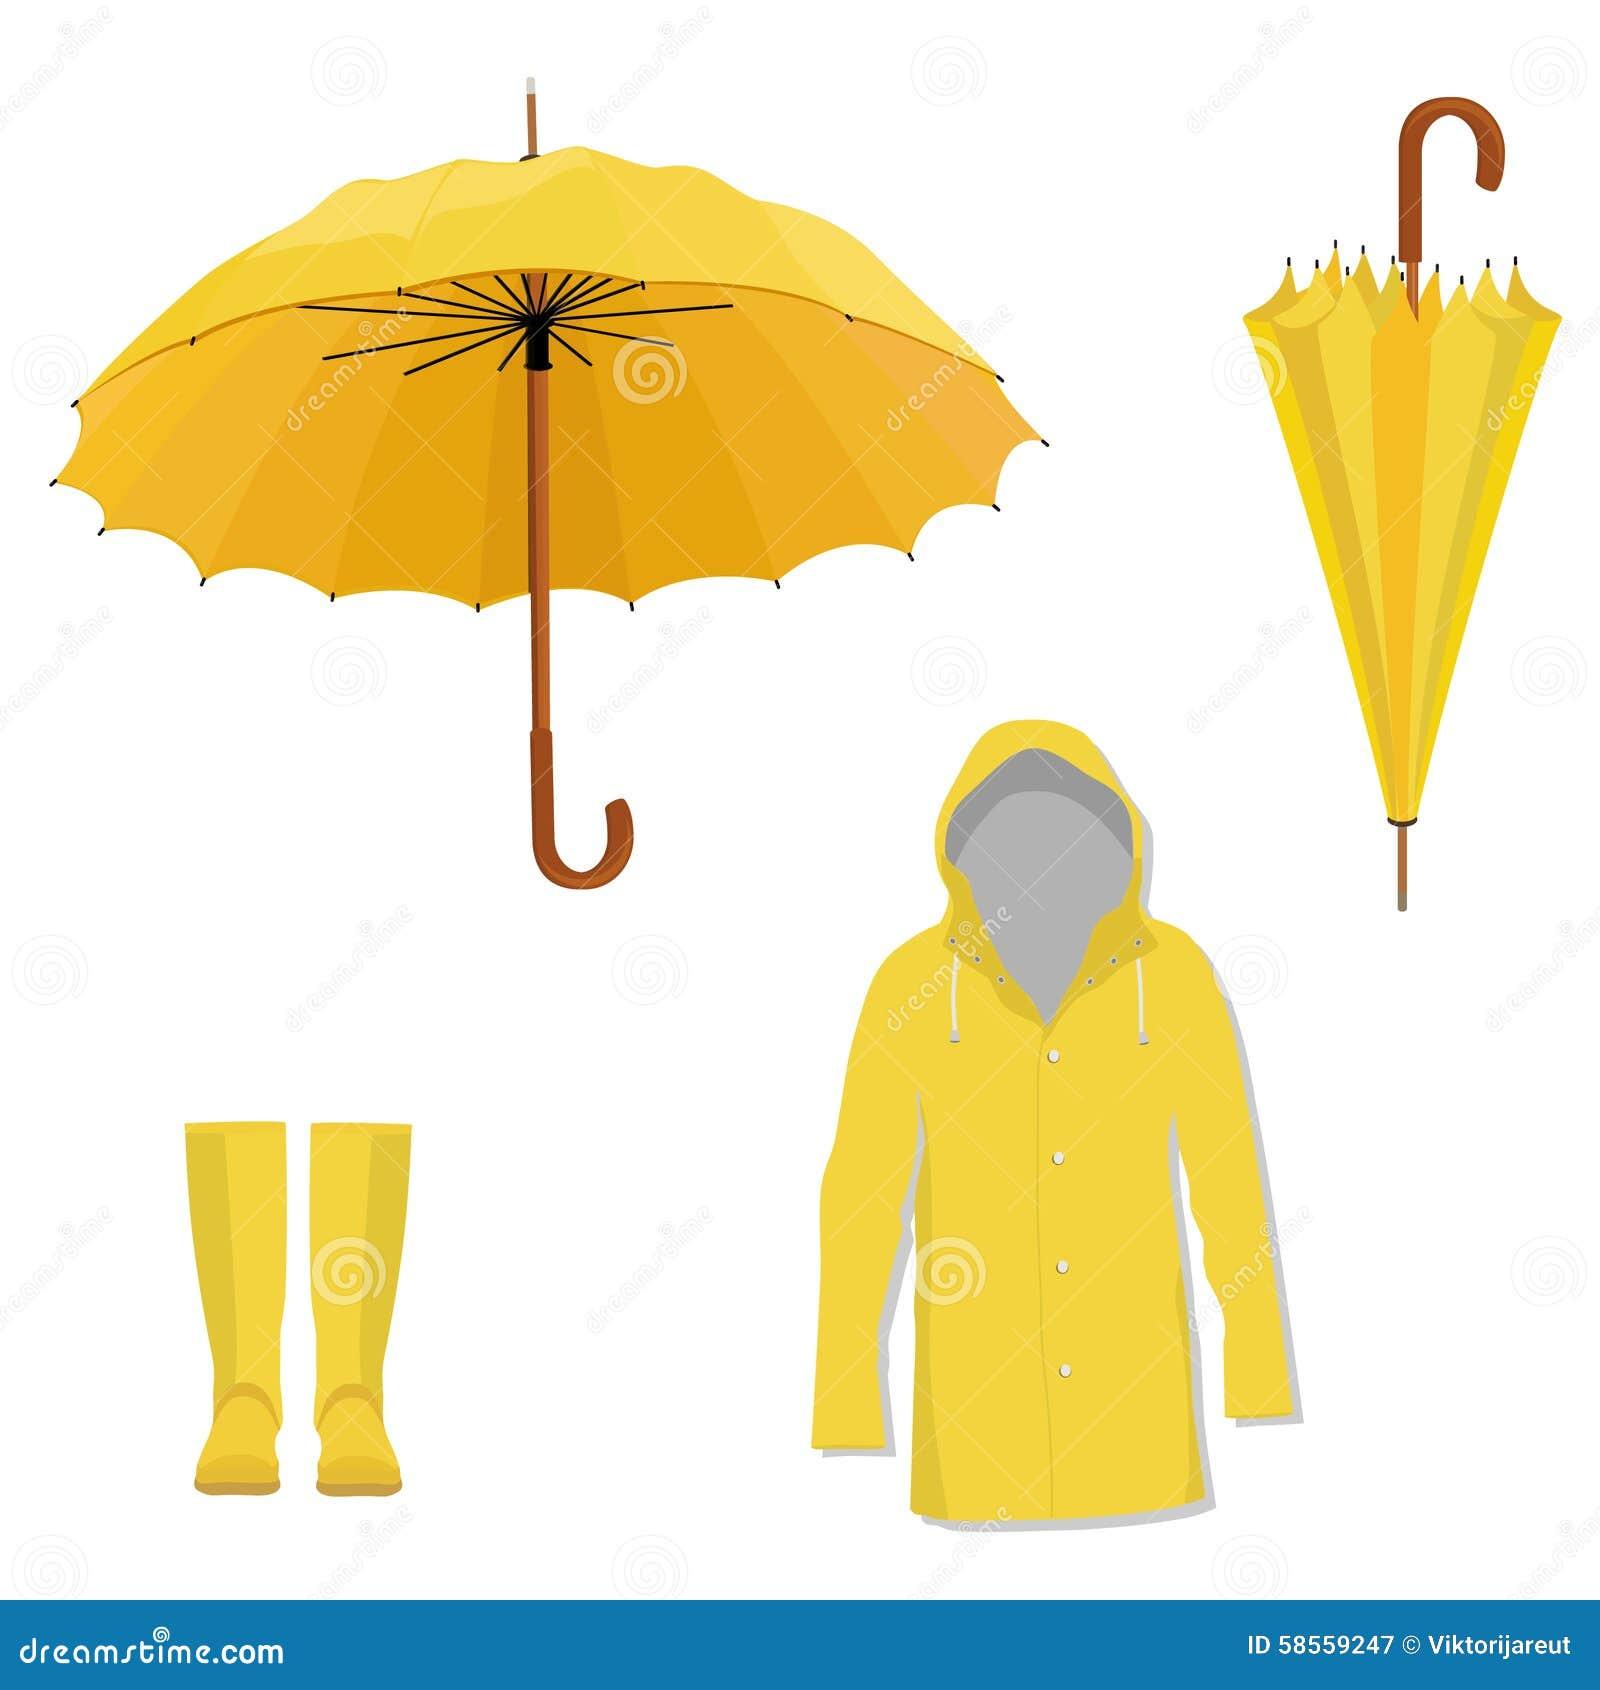 fb9951cae76 Capa de chuva amarela